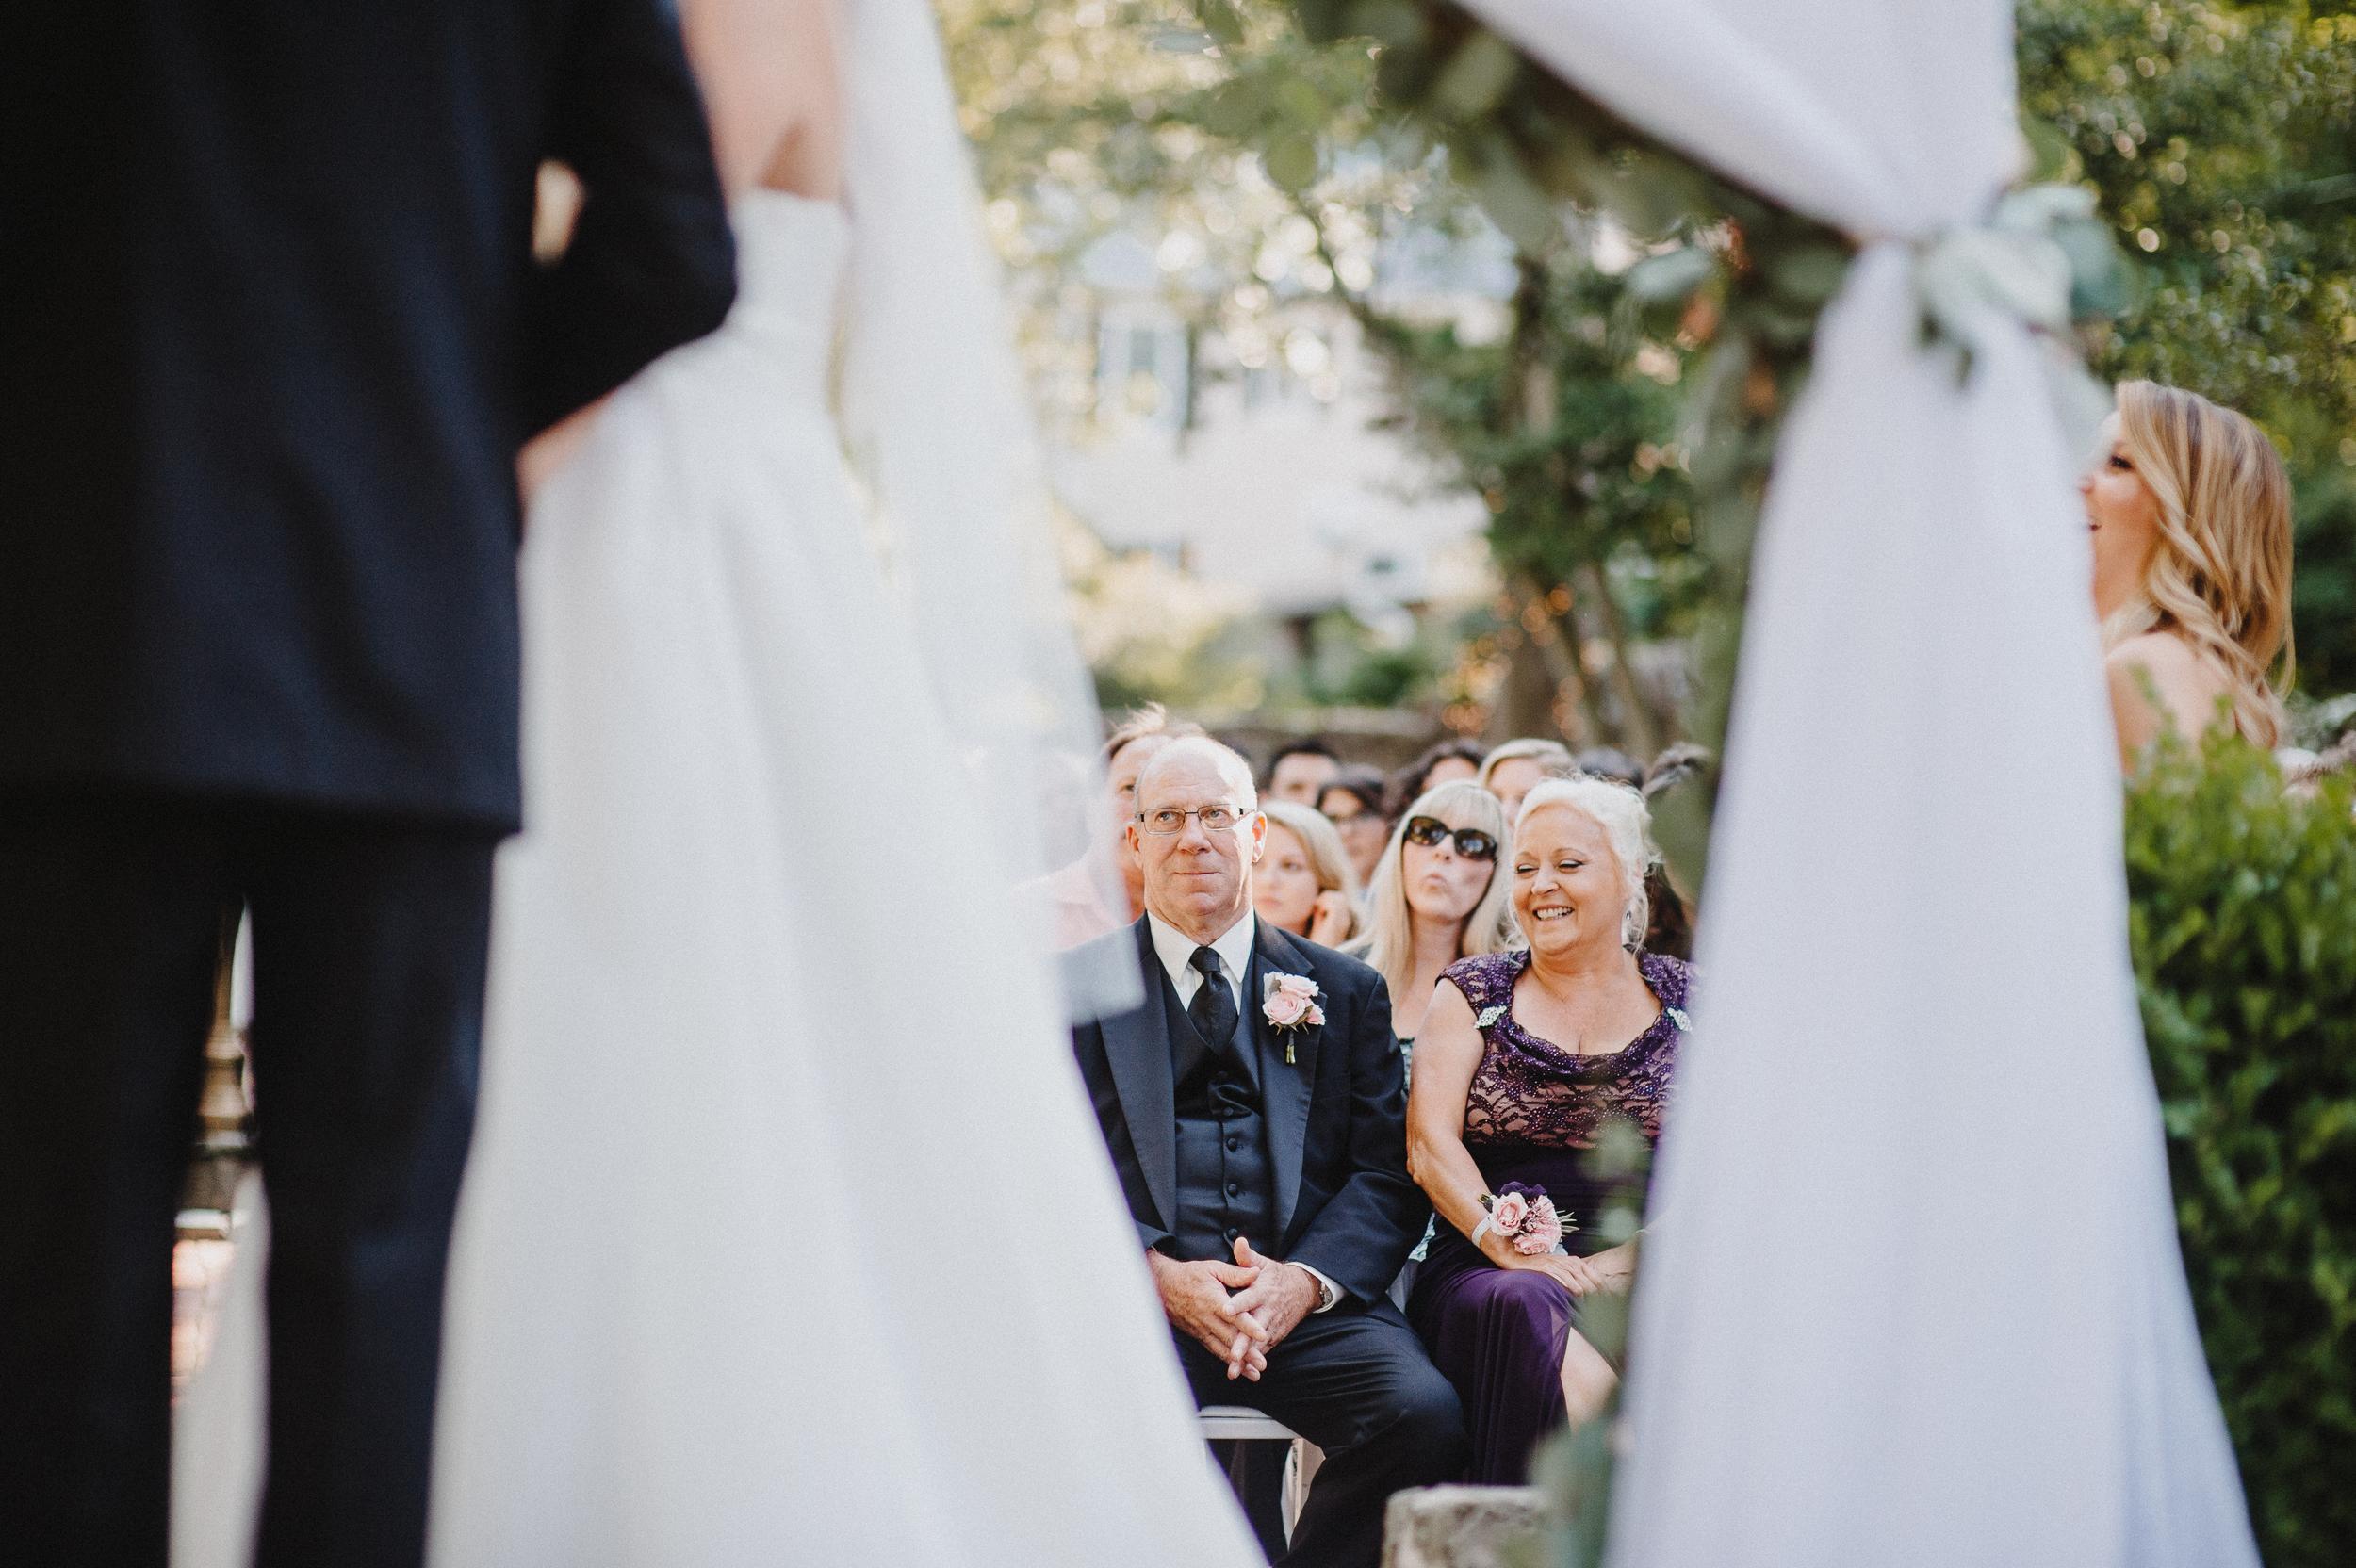 holly-hedge-estate-wedding-photographer-pat-robinson-photography-57.jpg